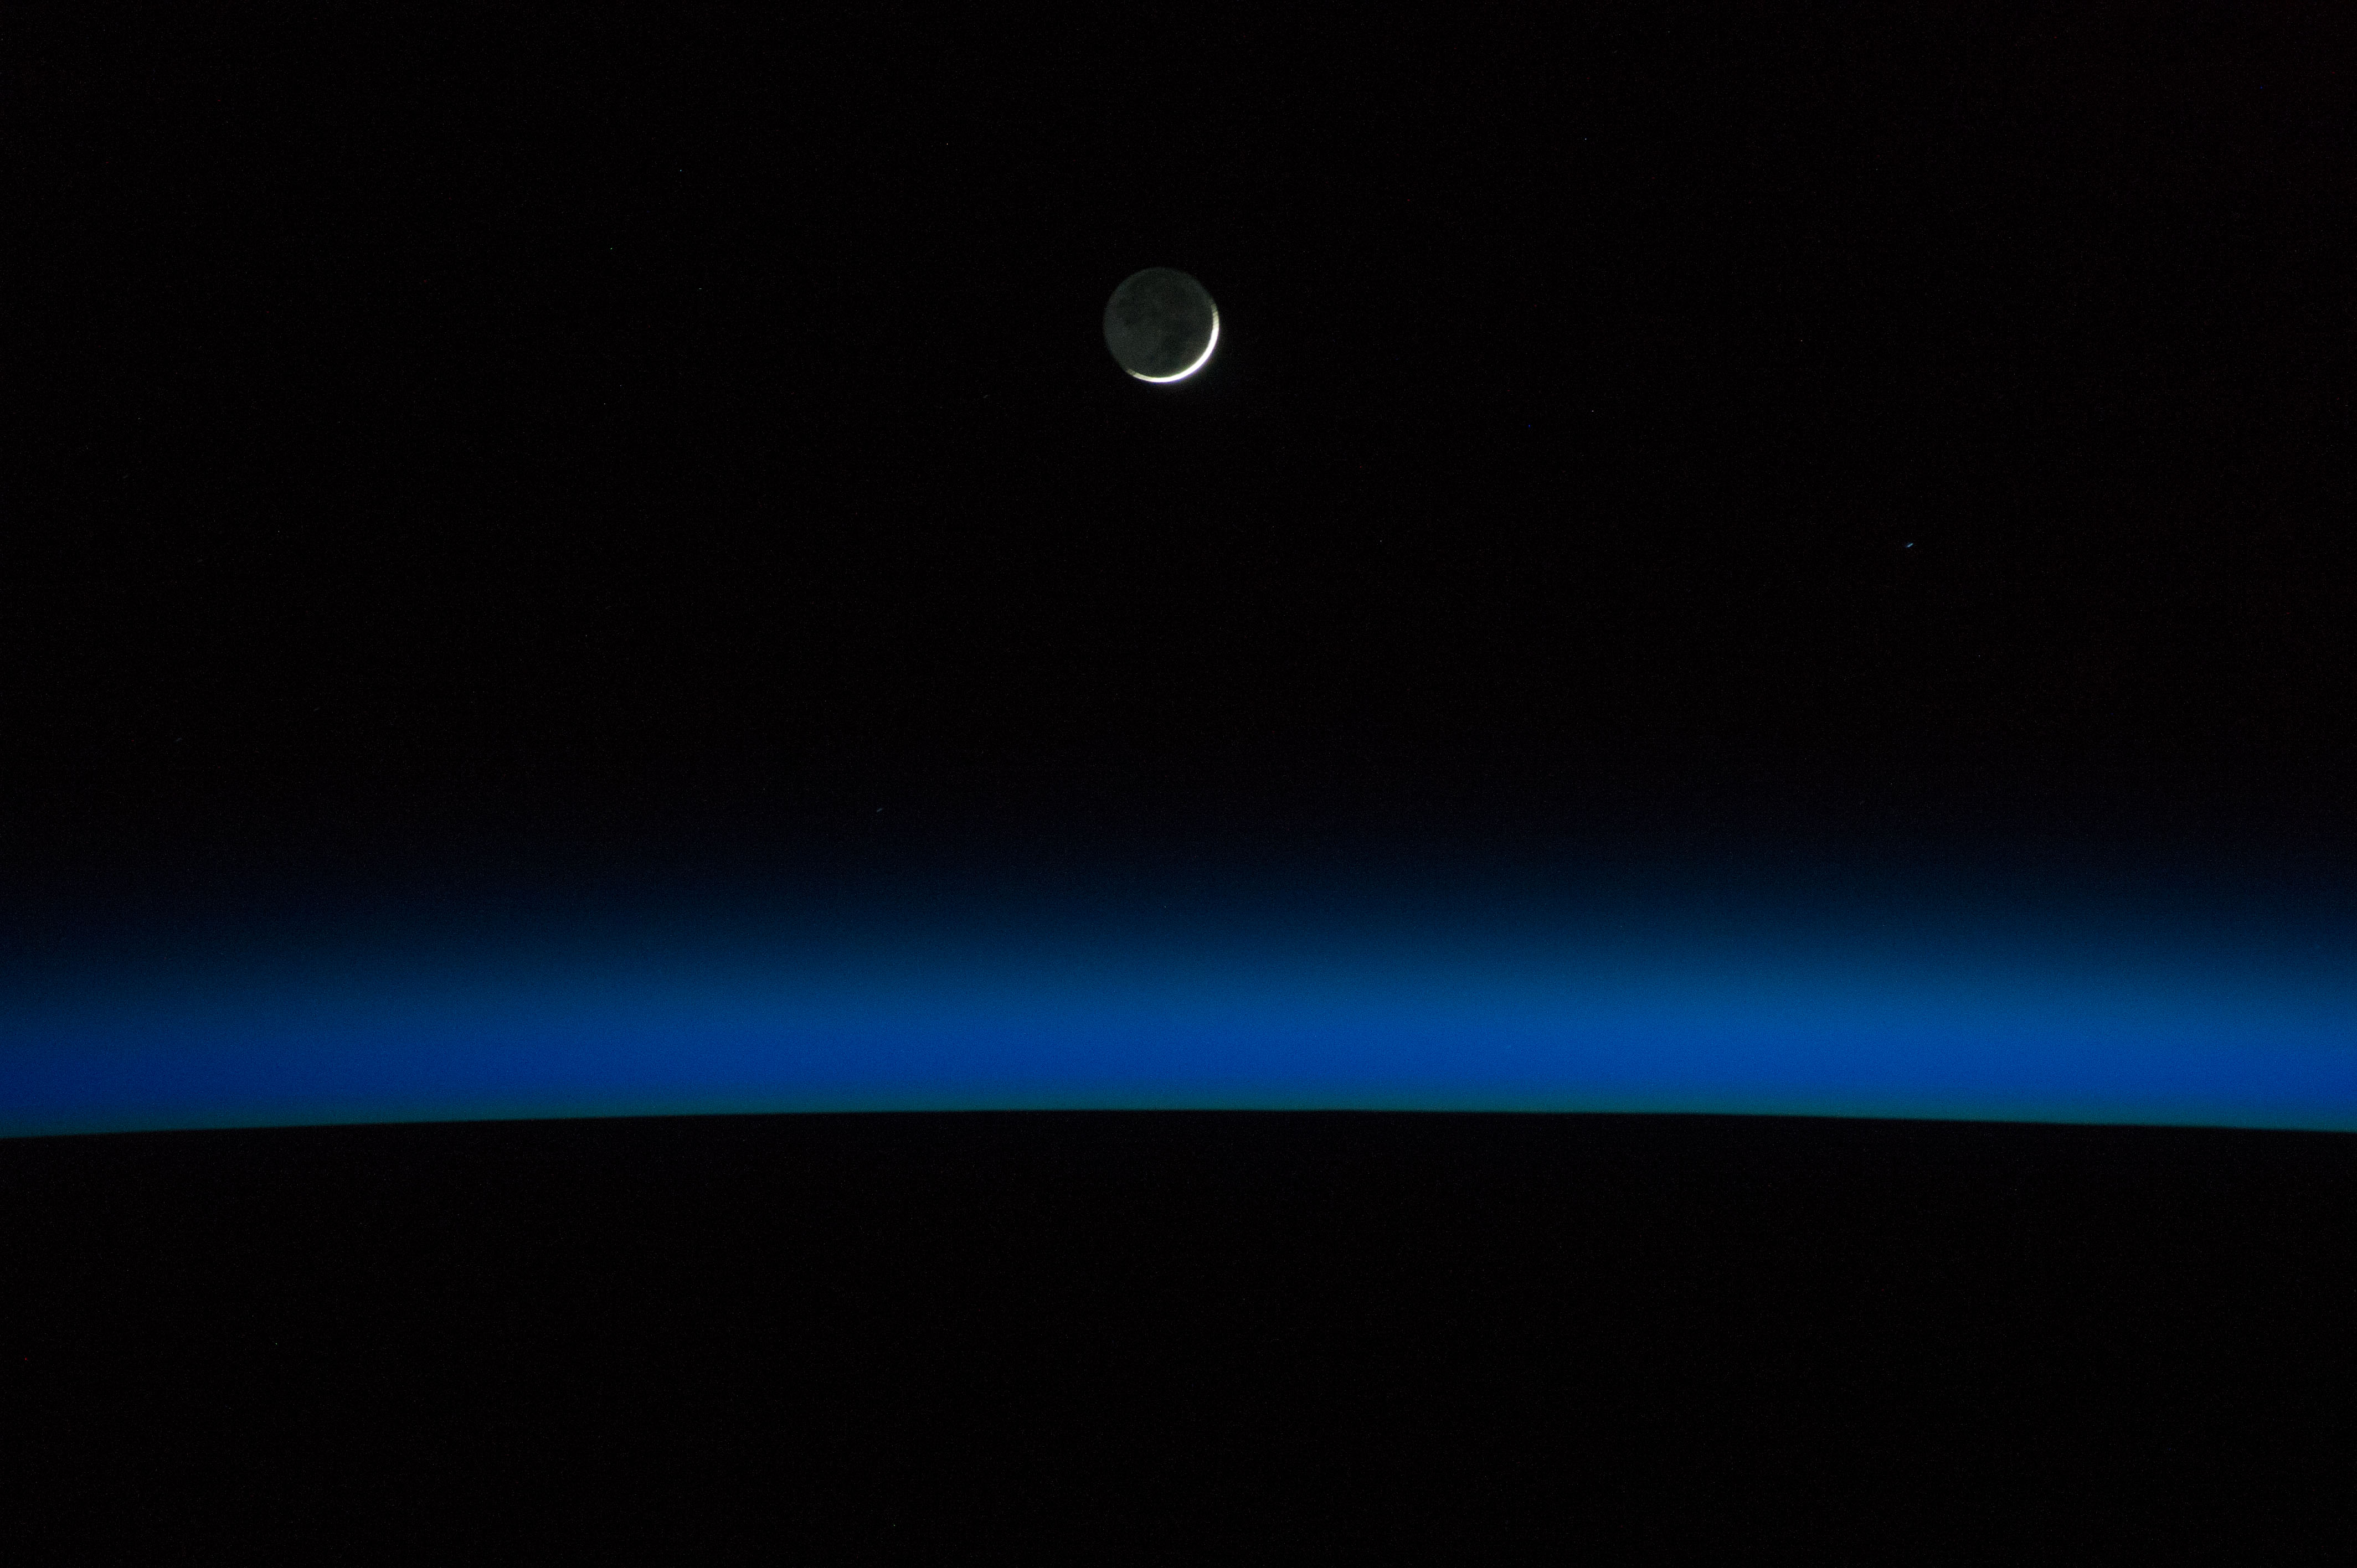 earth horizon nasa night - photo #43